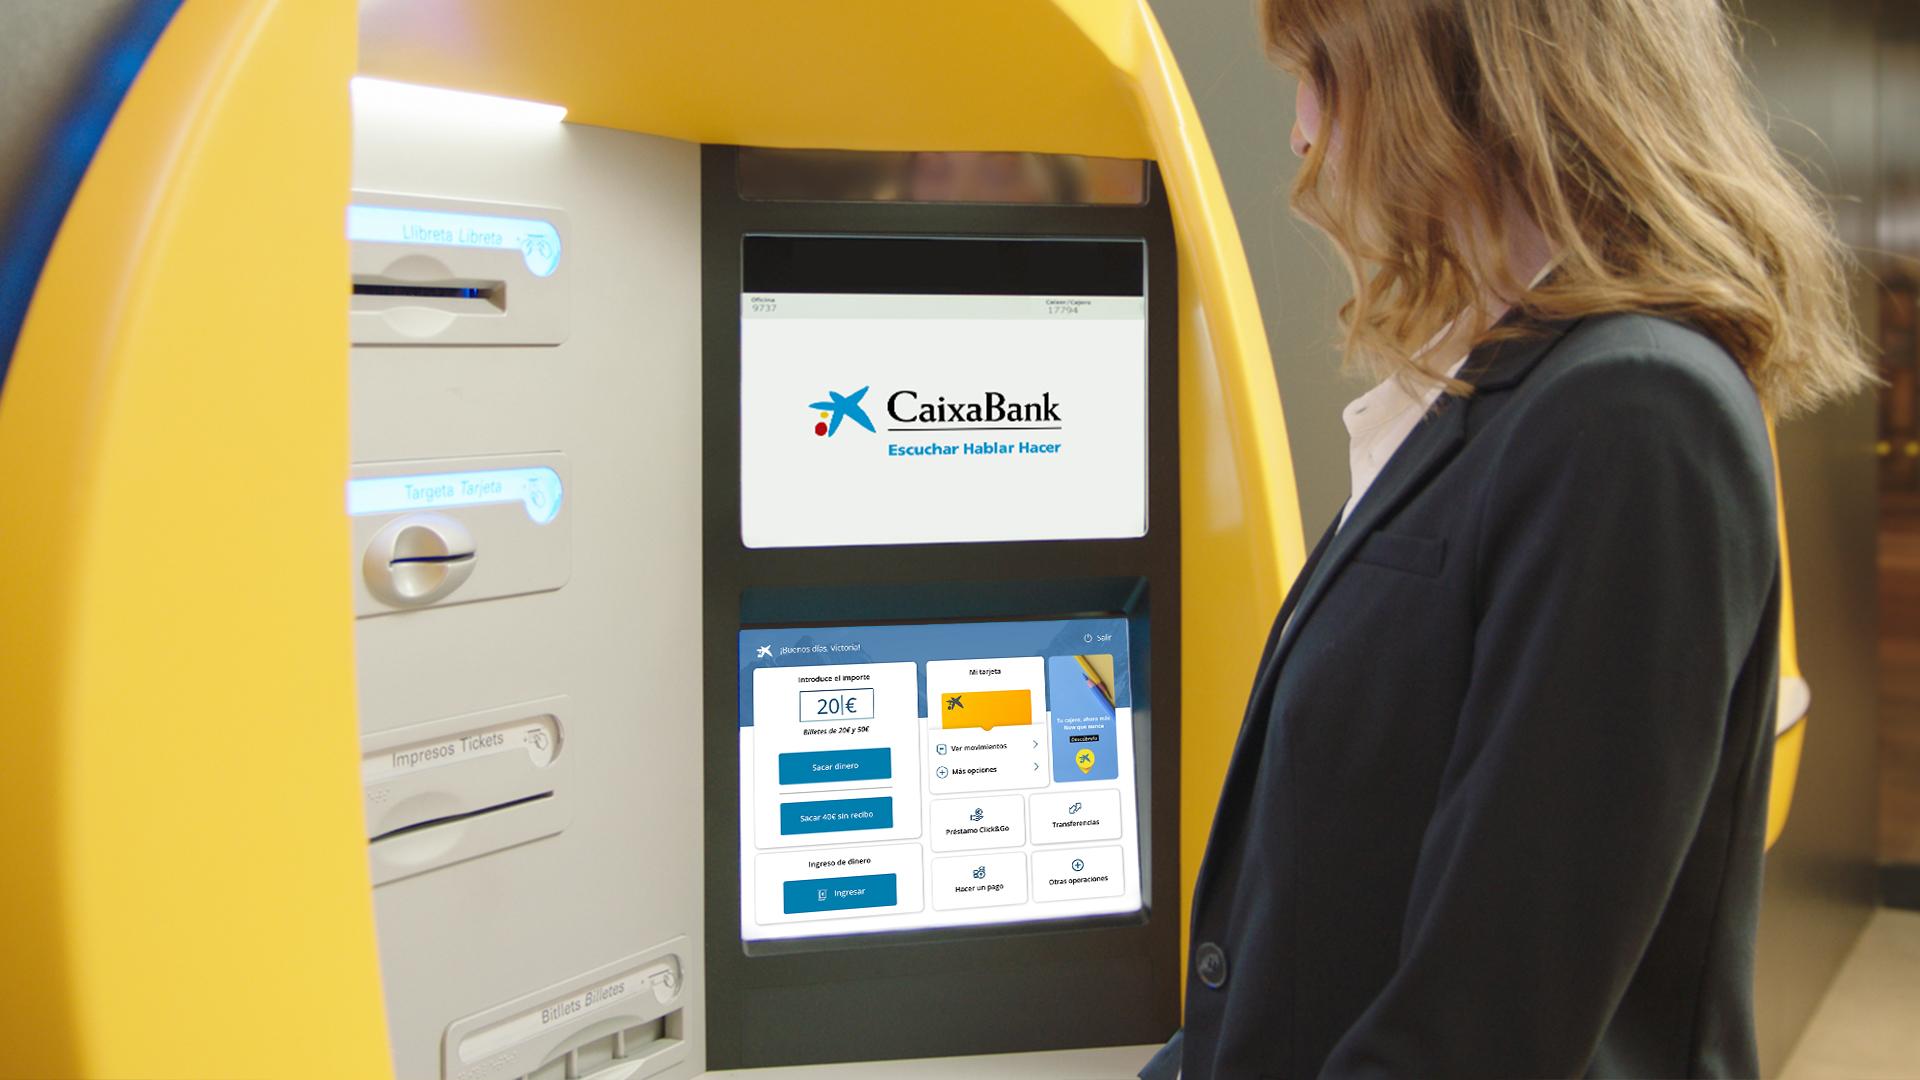 CaixaBank-cajeros.jpg